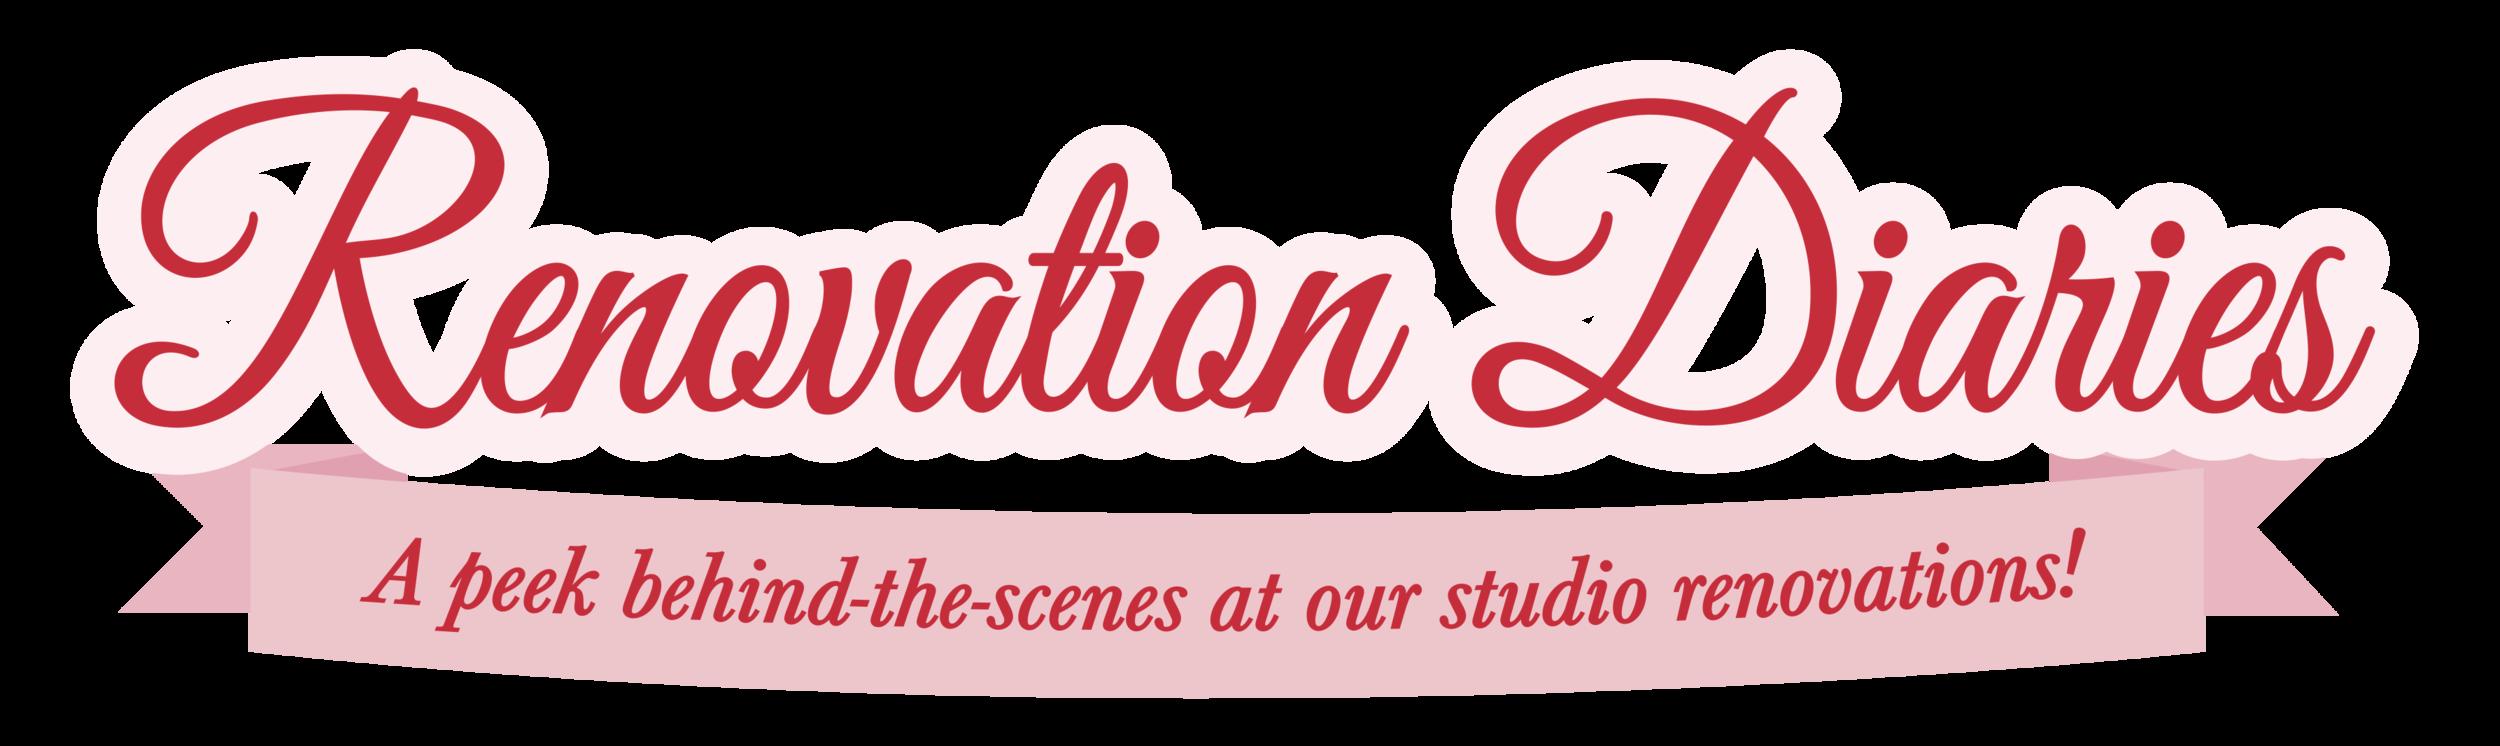 Renovation-Diaries.png